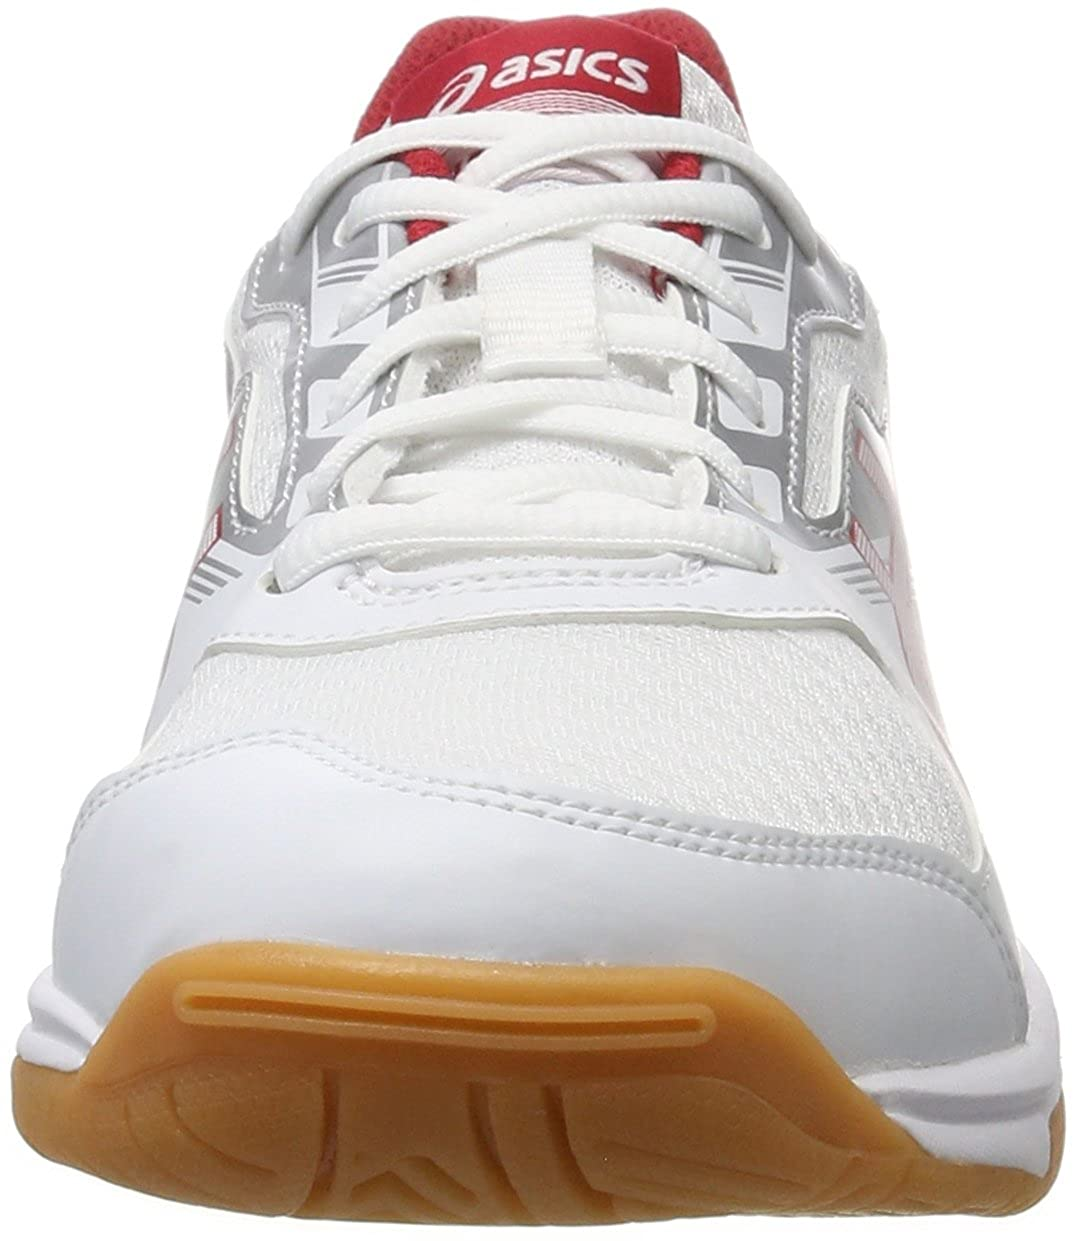 official photos 5b917 0d5db ASICS Upcourt 2, Chaussures de Volleyball Homme  Amazon.fr  Chaussures et  Sacs